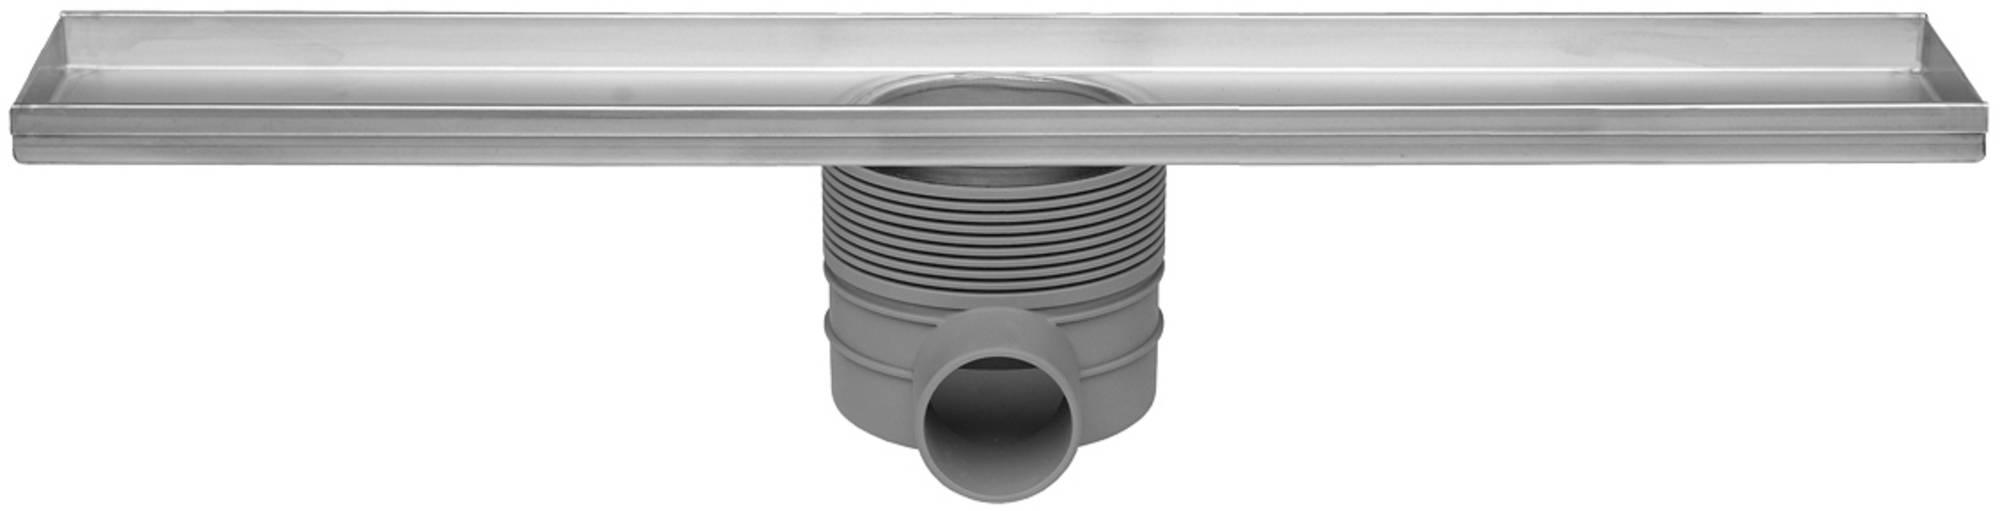 Easy Drain Multi inbouwdeel drain 90 cm zonder rooster RVS